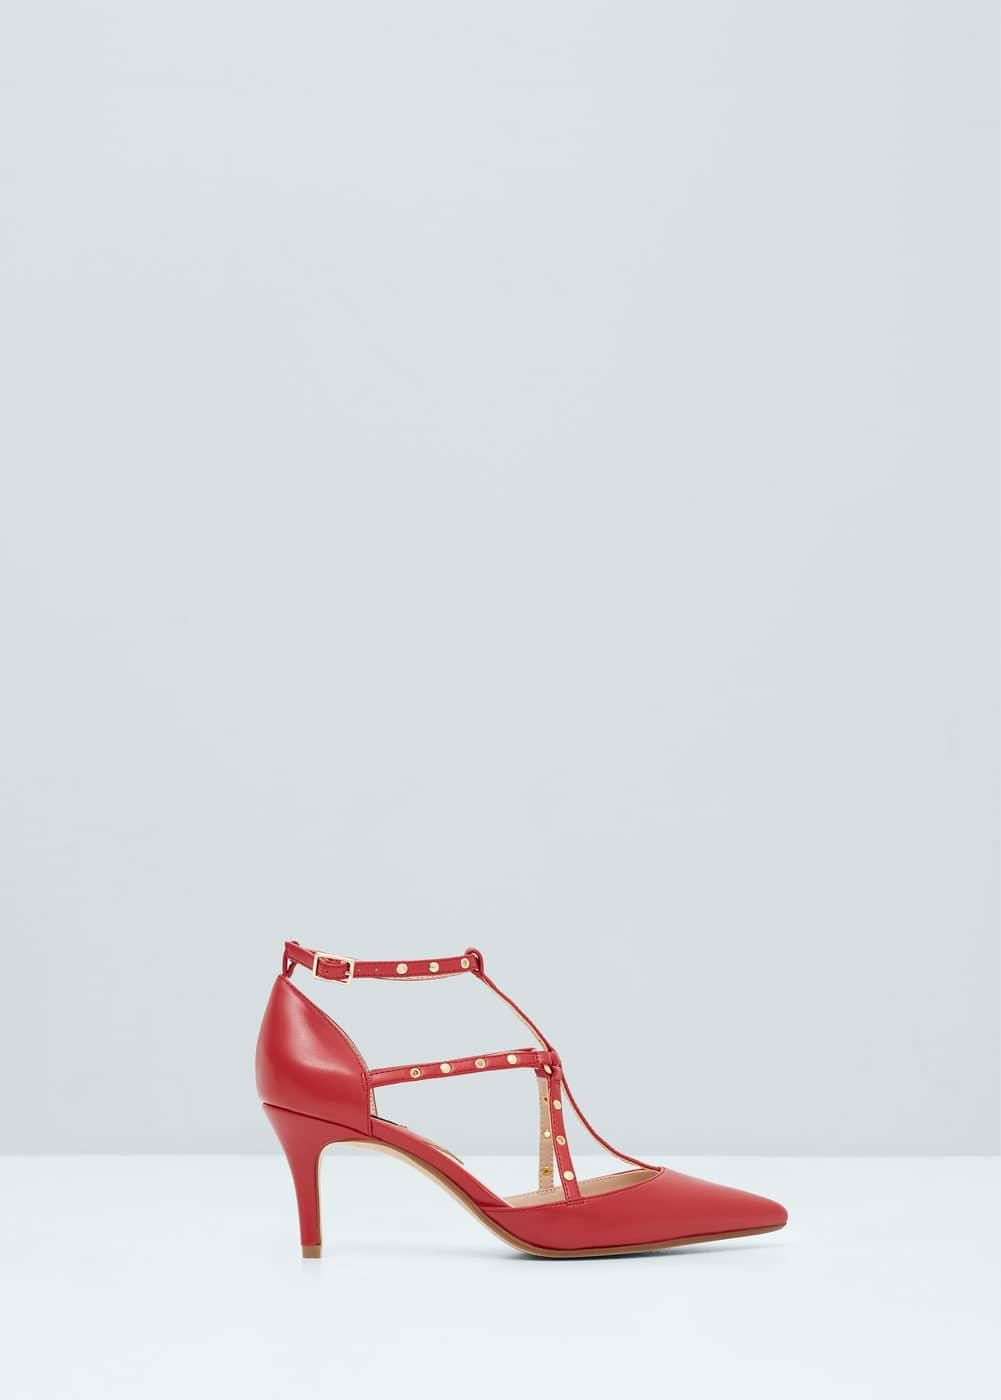 a4c64abefd3f Zapato salón pulseras - Mujer